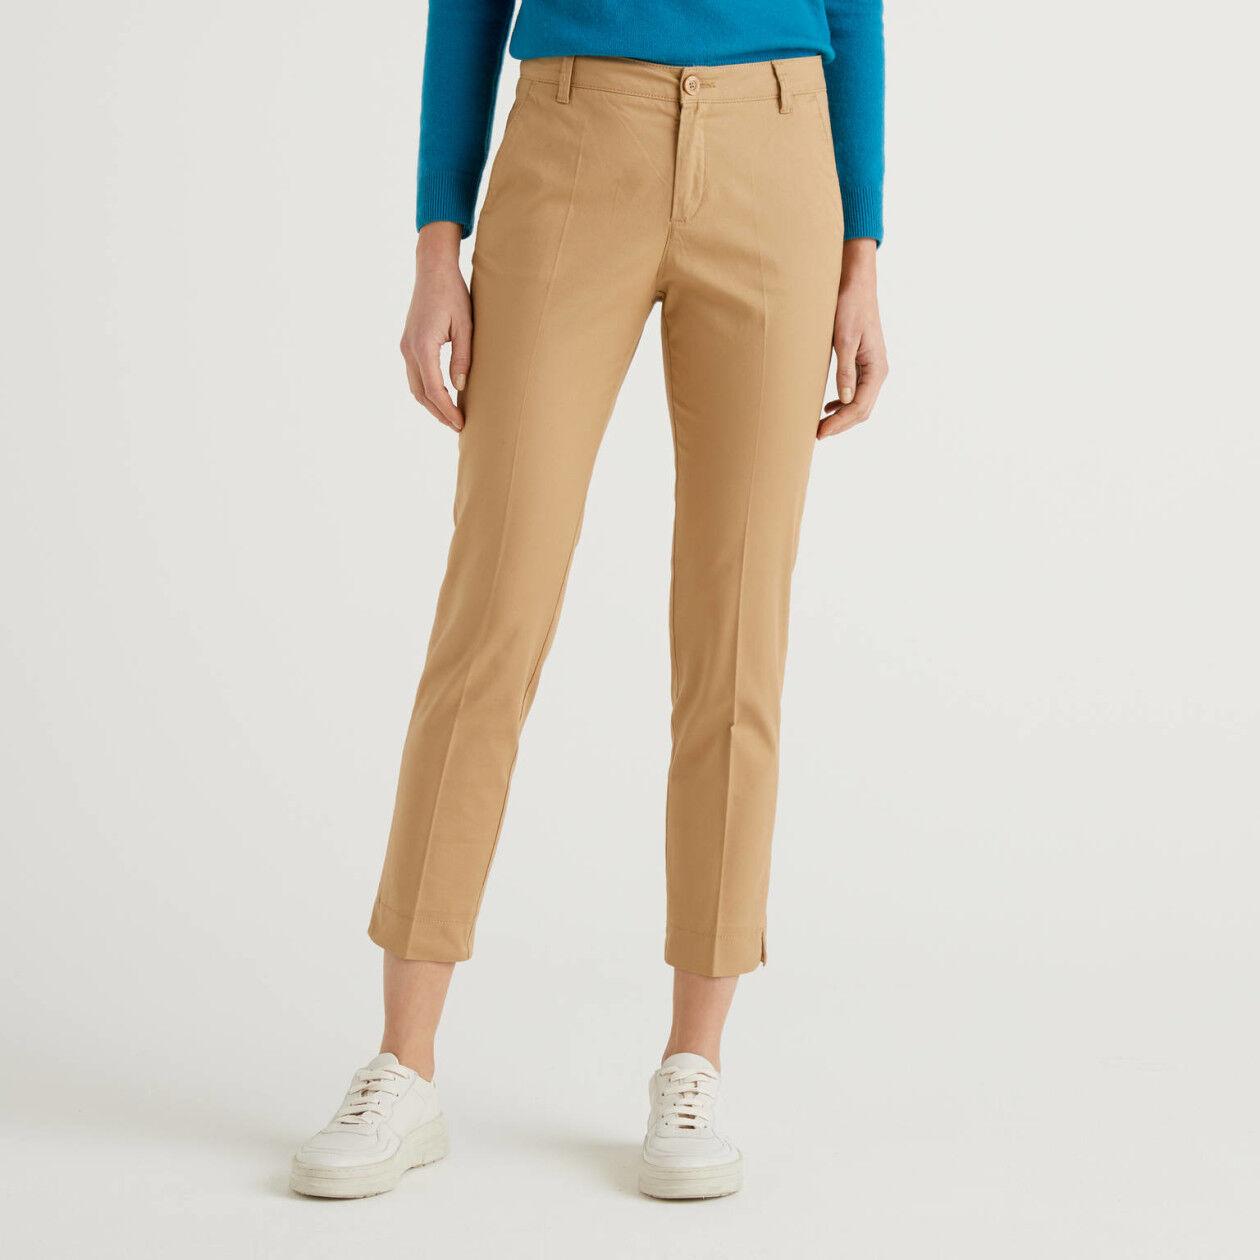 Pantalon chino stretch